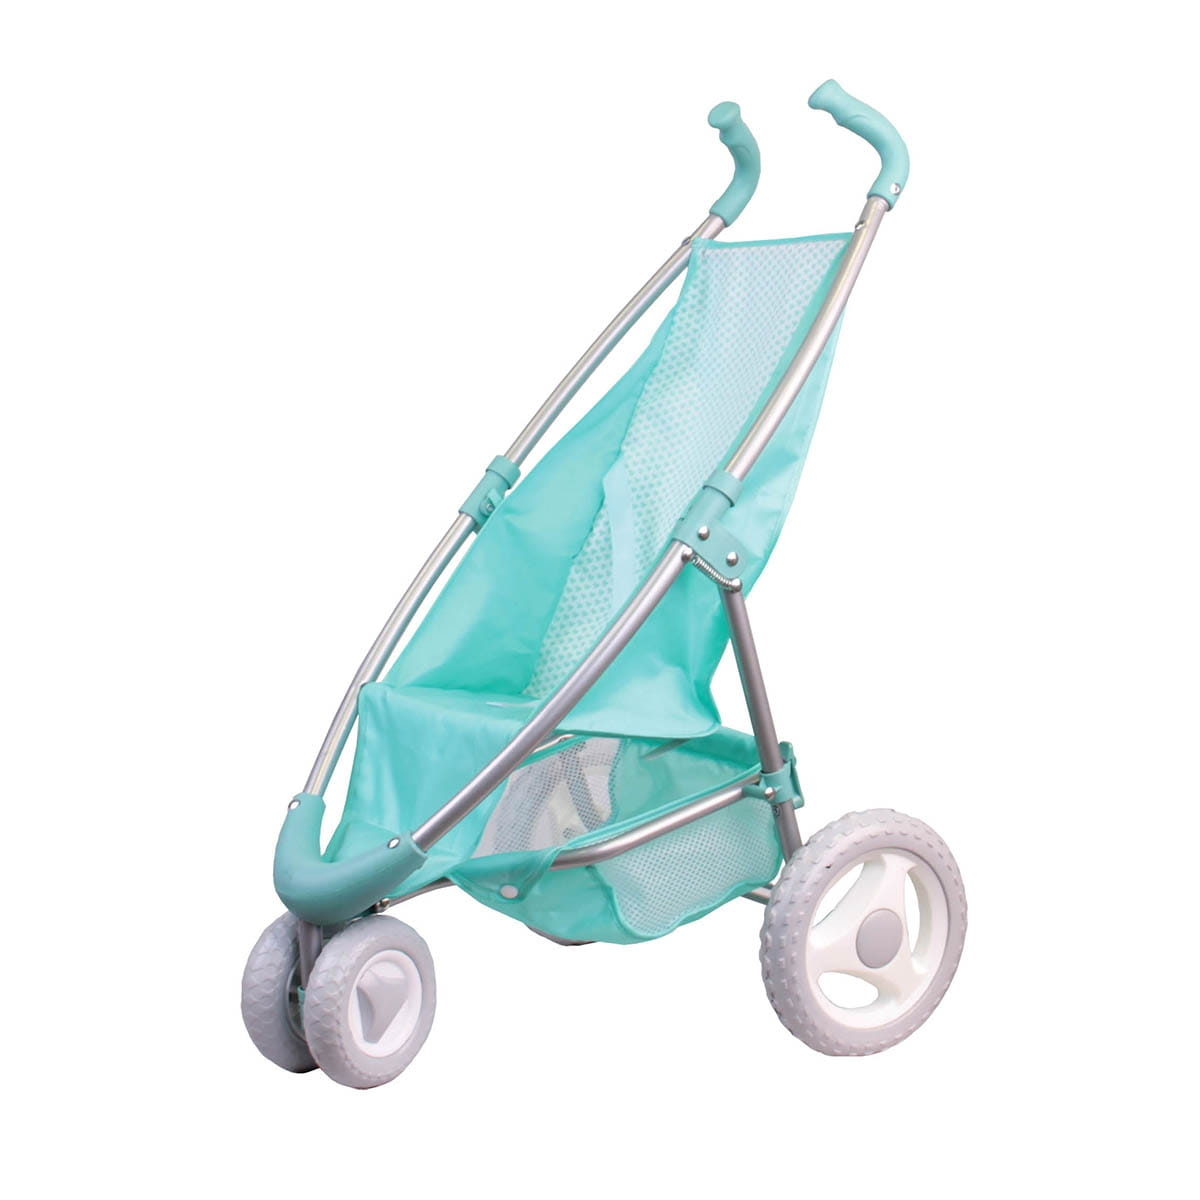 Прогулочная коляска для кукол GULLIVER с поворотными колесами - мятная